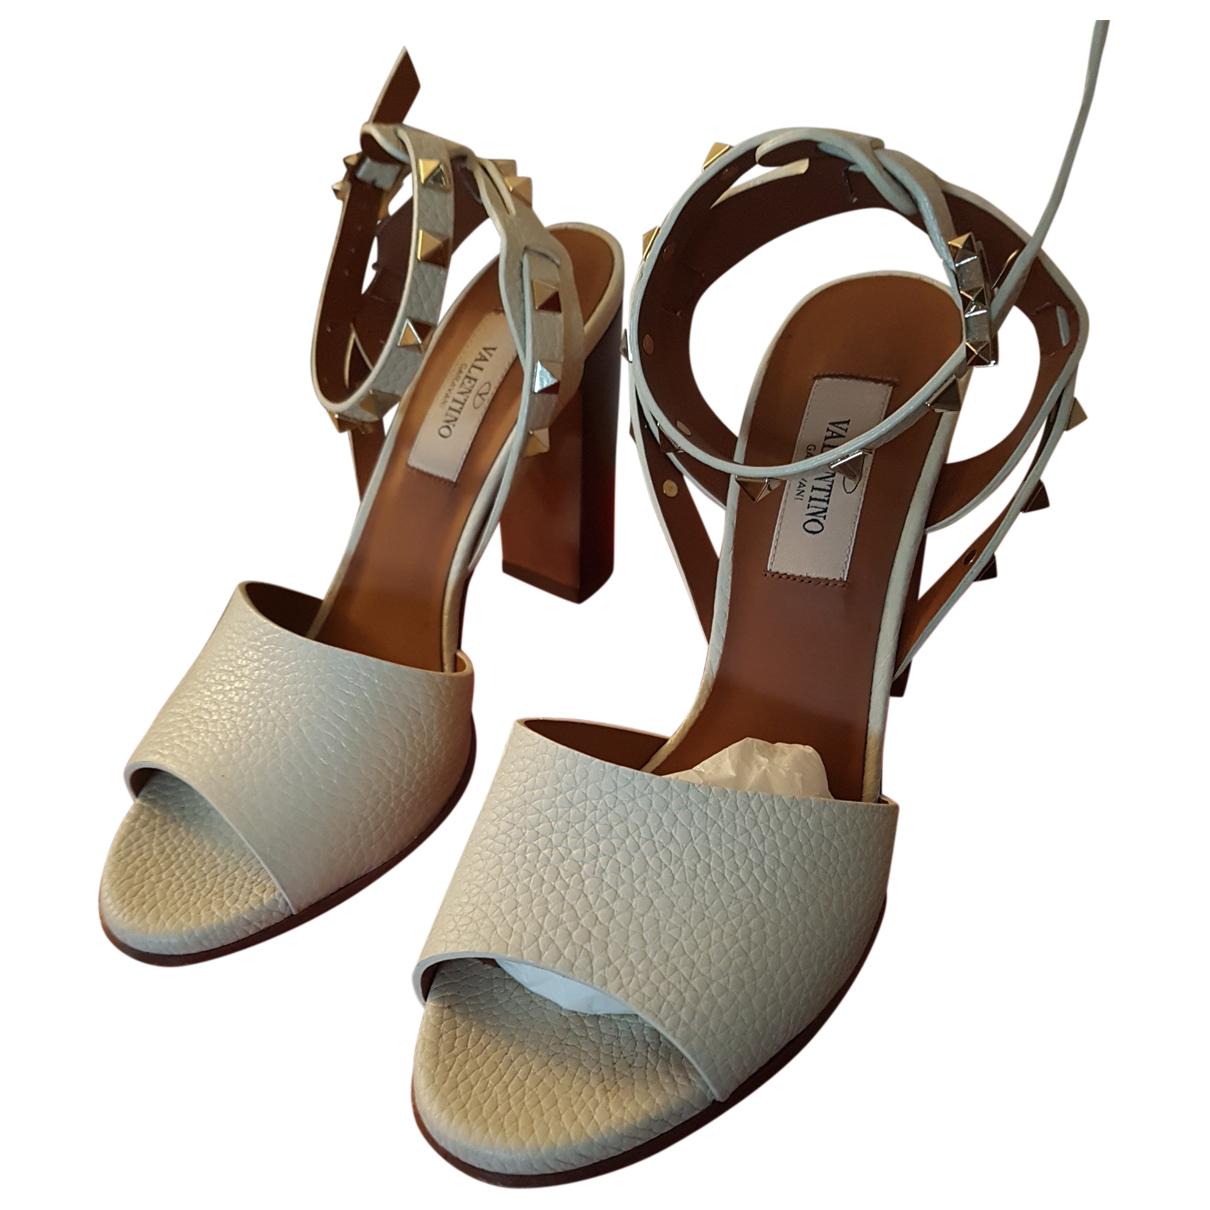 Valentino Garavani Rockstud White Leather Sandals for Women 37.5 EU